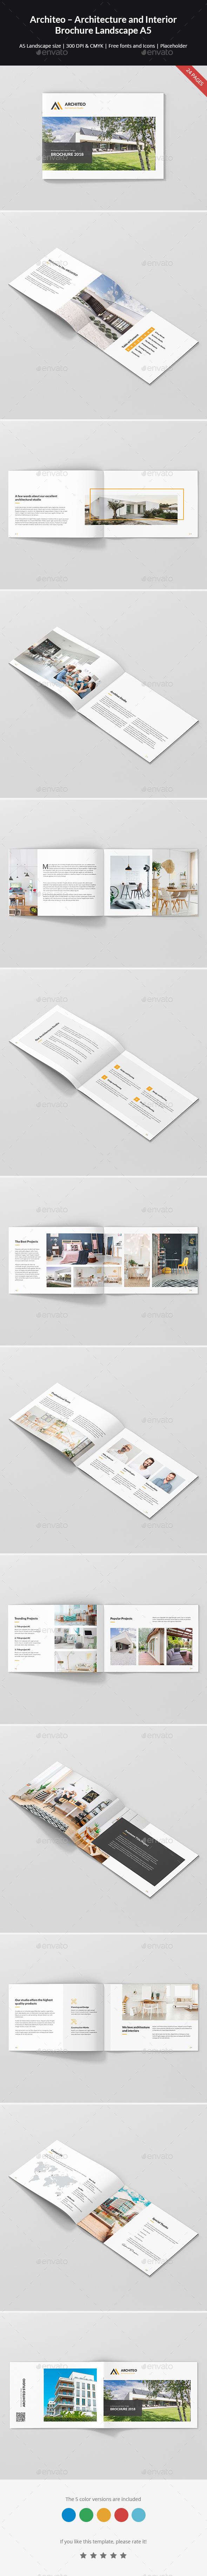 Architeo – Architecture and Interior Brochure Landscape A5 - Portfolio Brochures